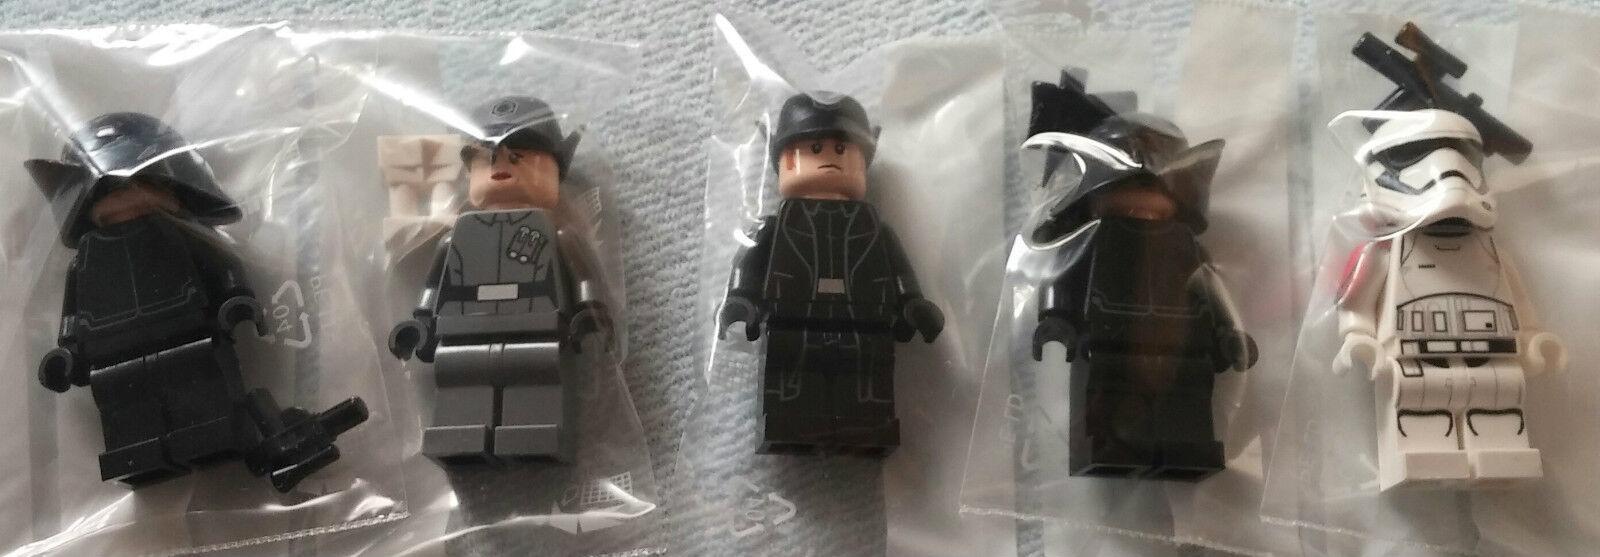 LEGO ® Star Wars ™ 5 personaggi da 75104: first order Stormtrooper/Crew 2x/Officer